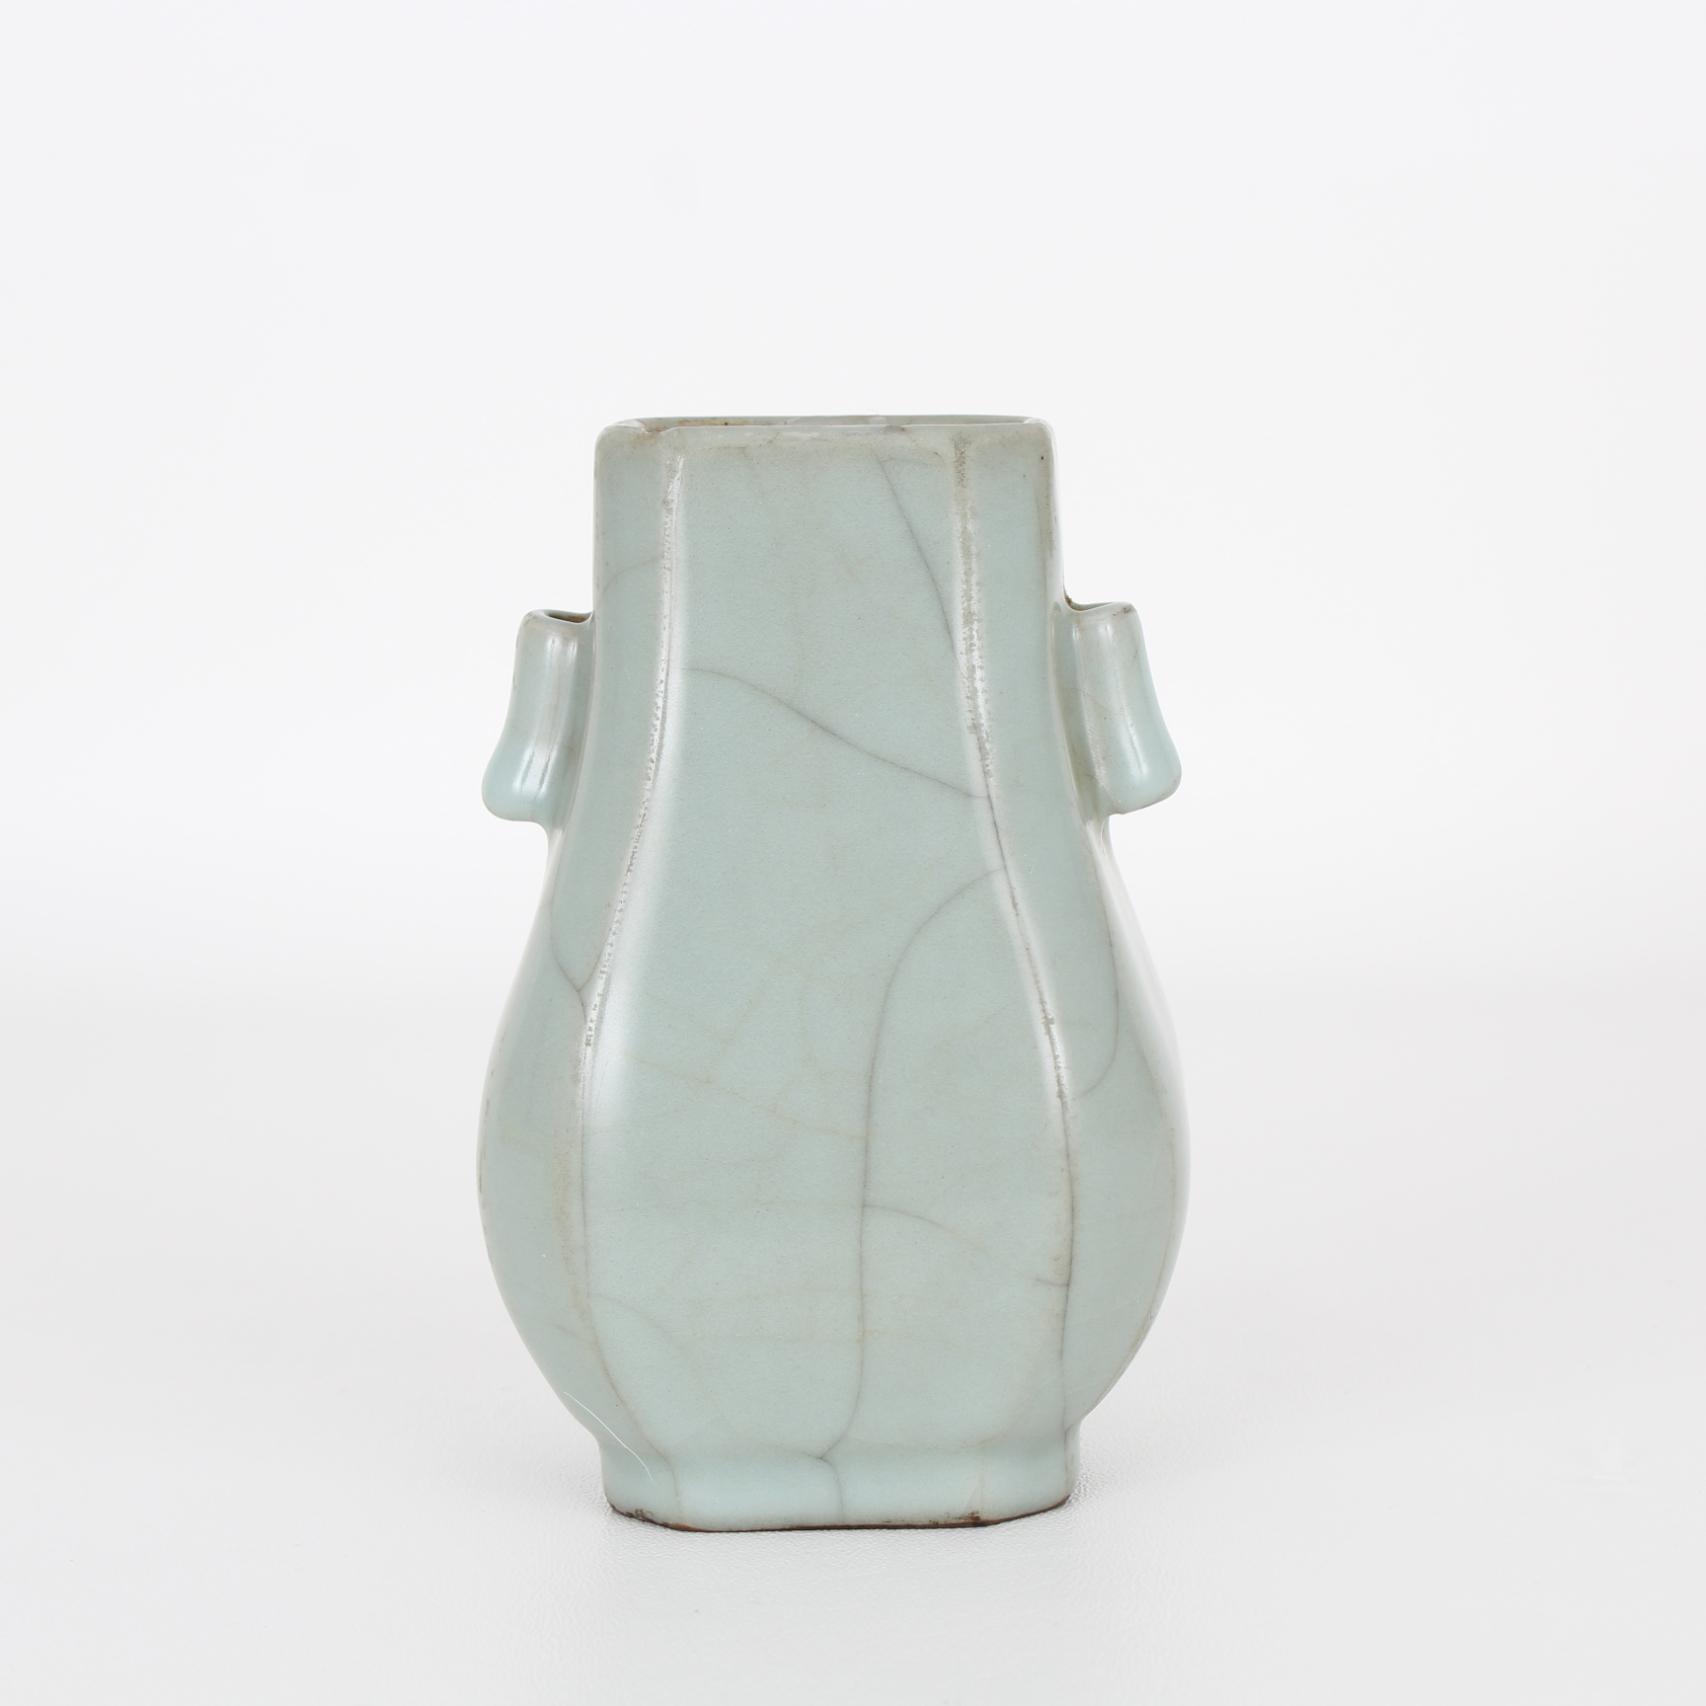 Chinese Guan-Type Vase, Qianlong Mark